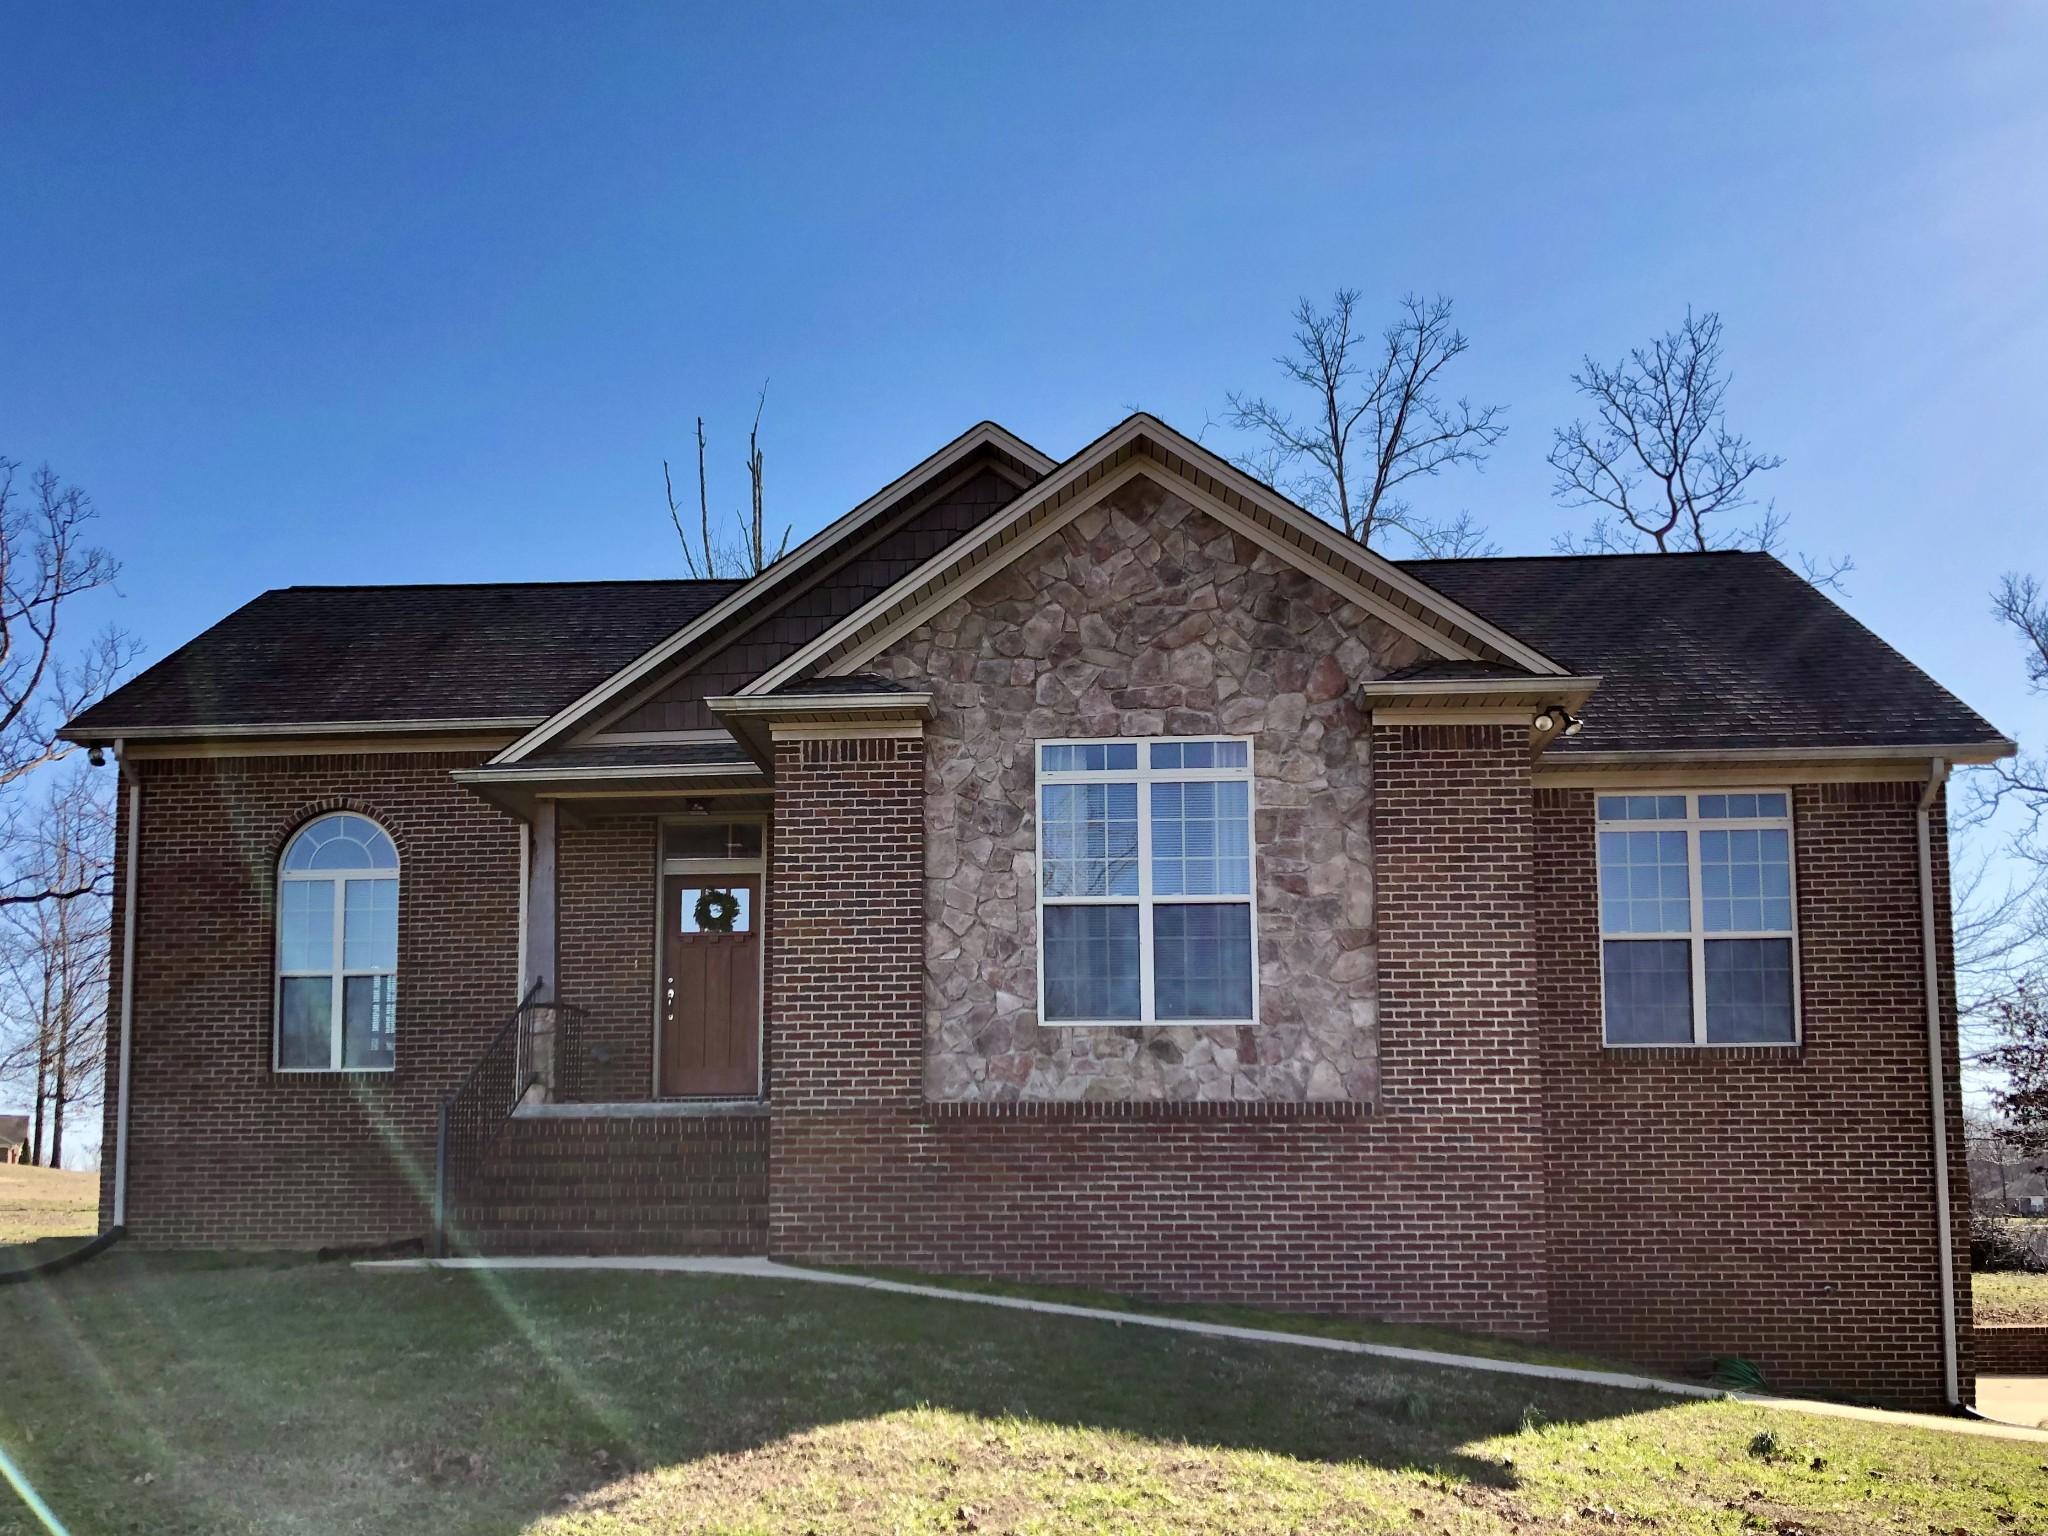 17 Cottonwood Ln, W, Lawrenceburg, TN 38464 - Lawrenceburg, TN real estate listing